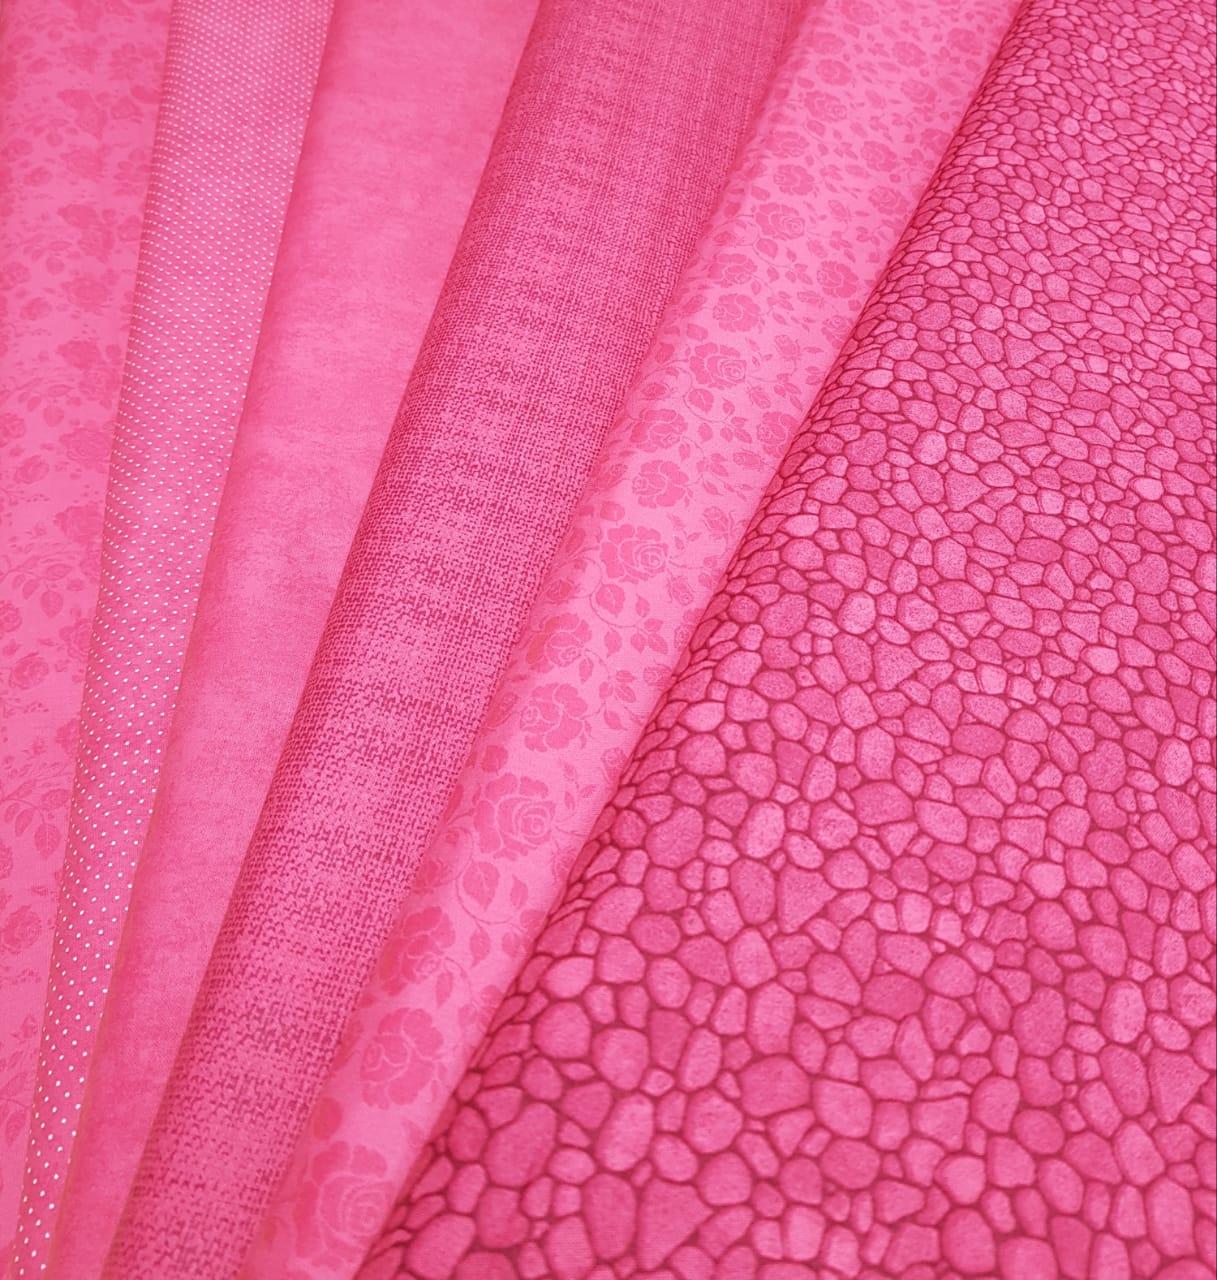 Kit composê rosa - 6 estampas / 0,25cm x 1,50m (cada)